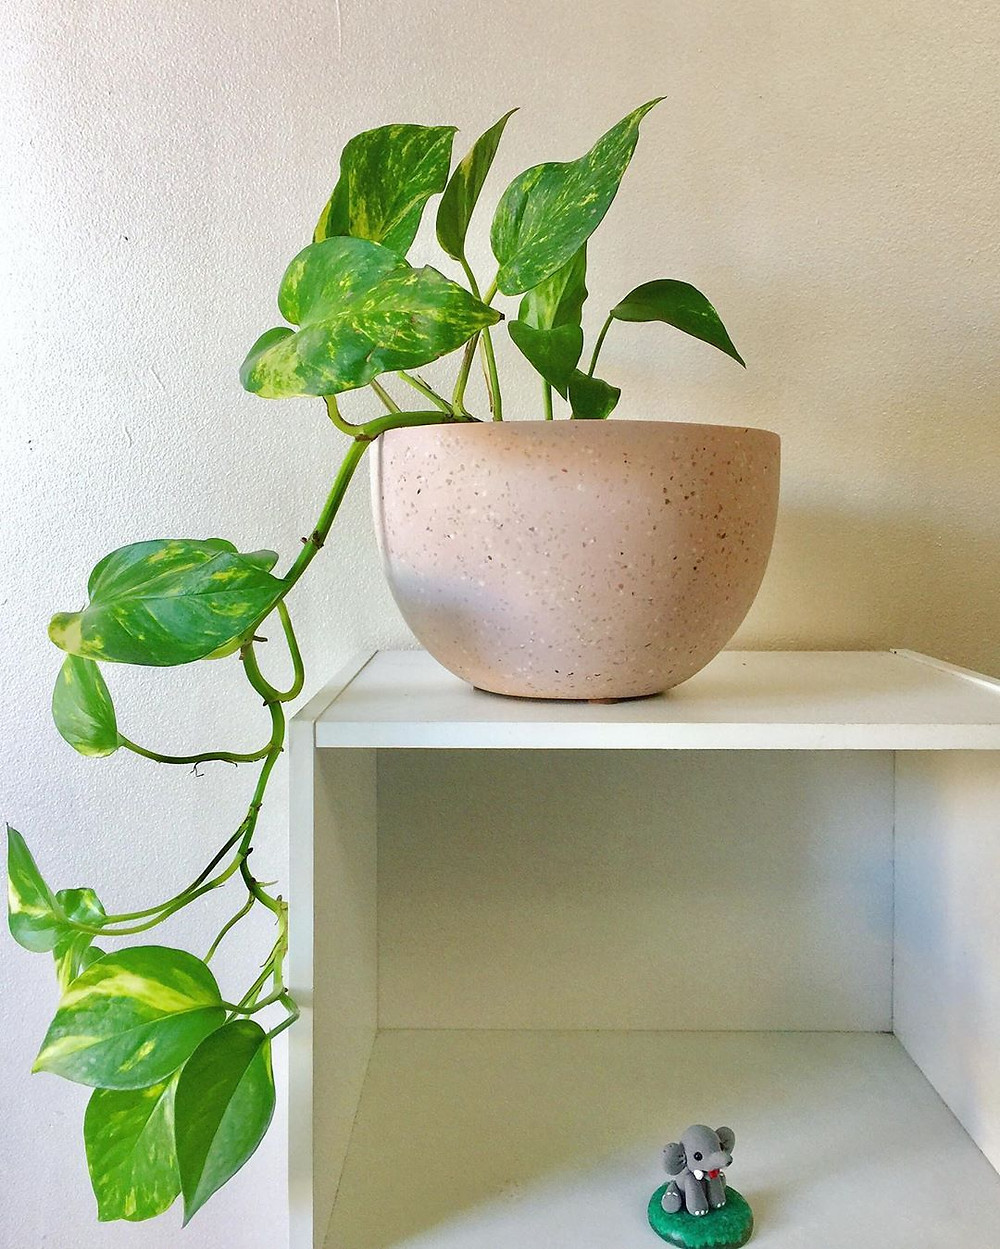 Golden Pothos Quick Fast Growing Houseplant